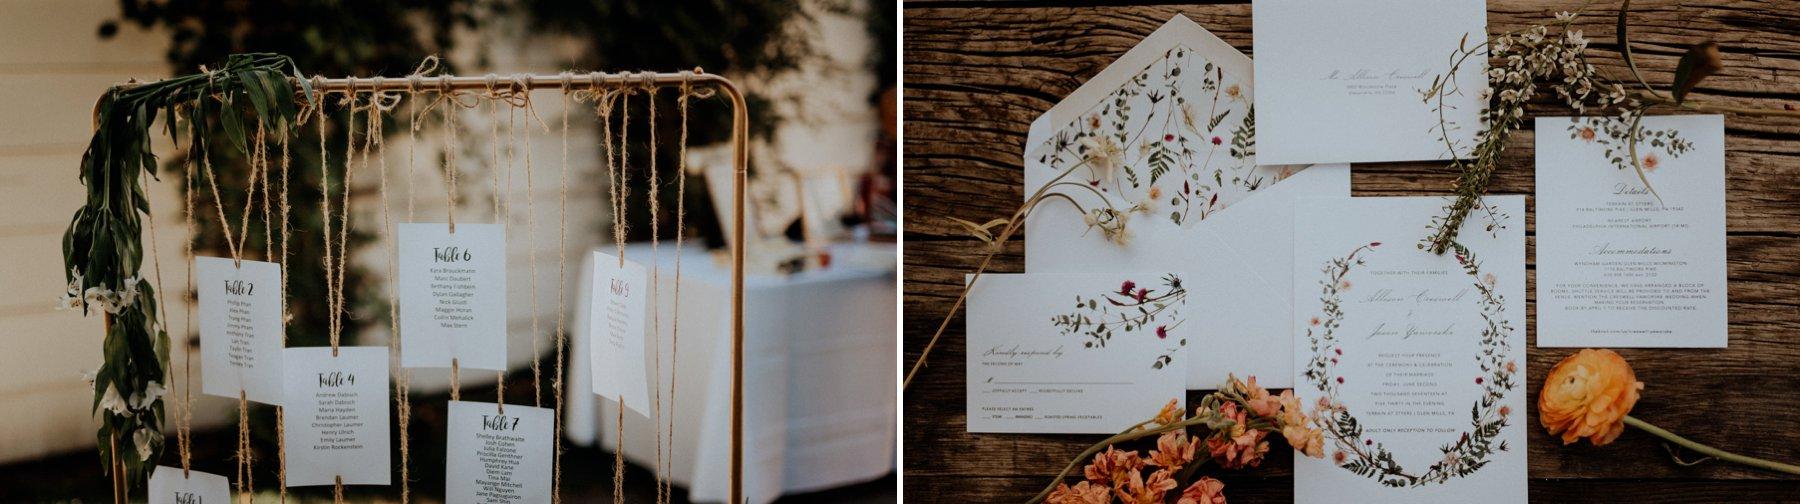 234-232-appleford-estate-wedding-22.jpg